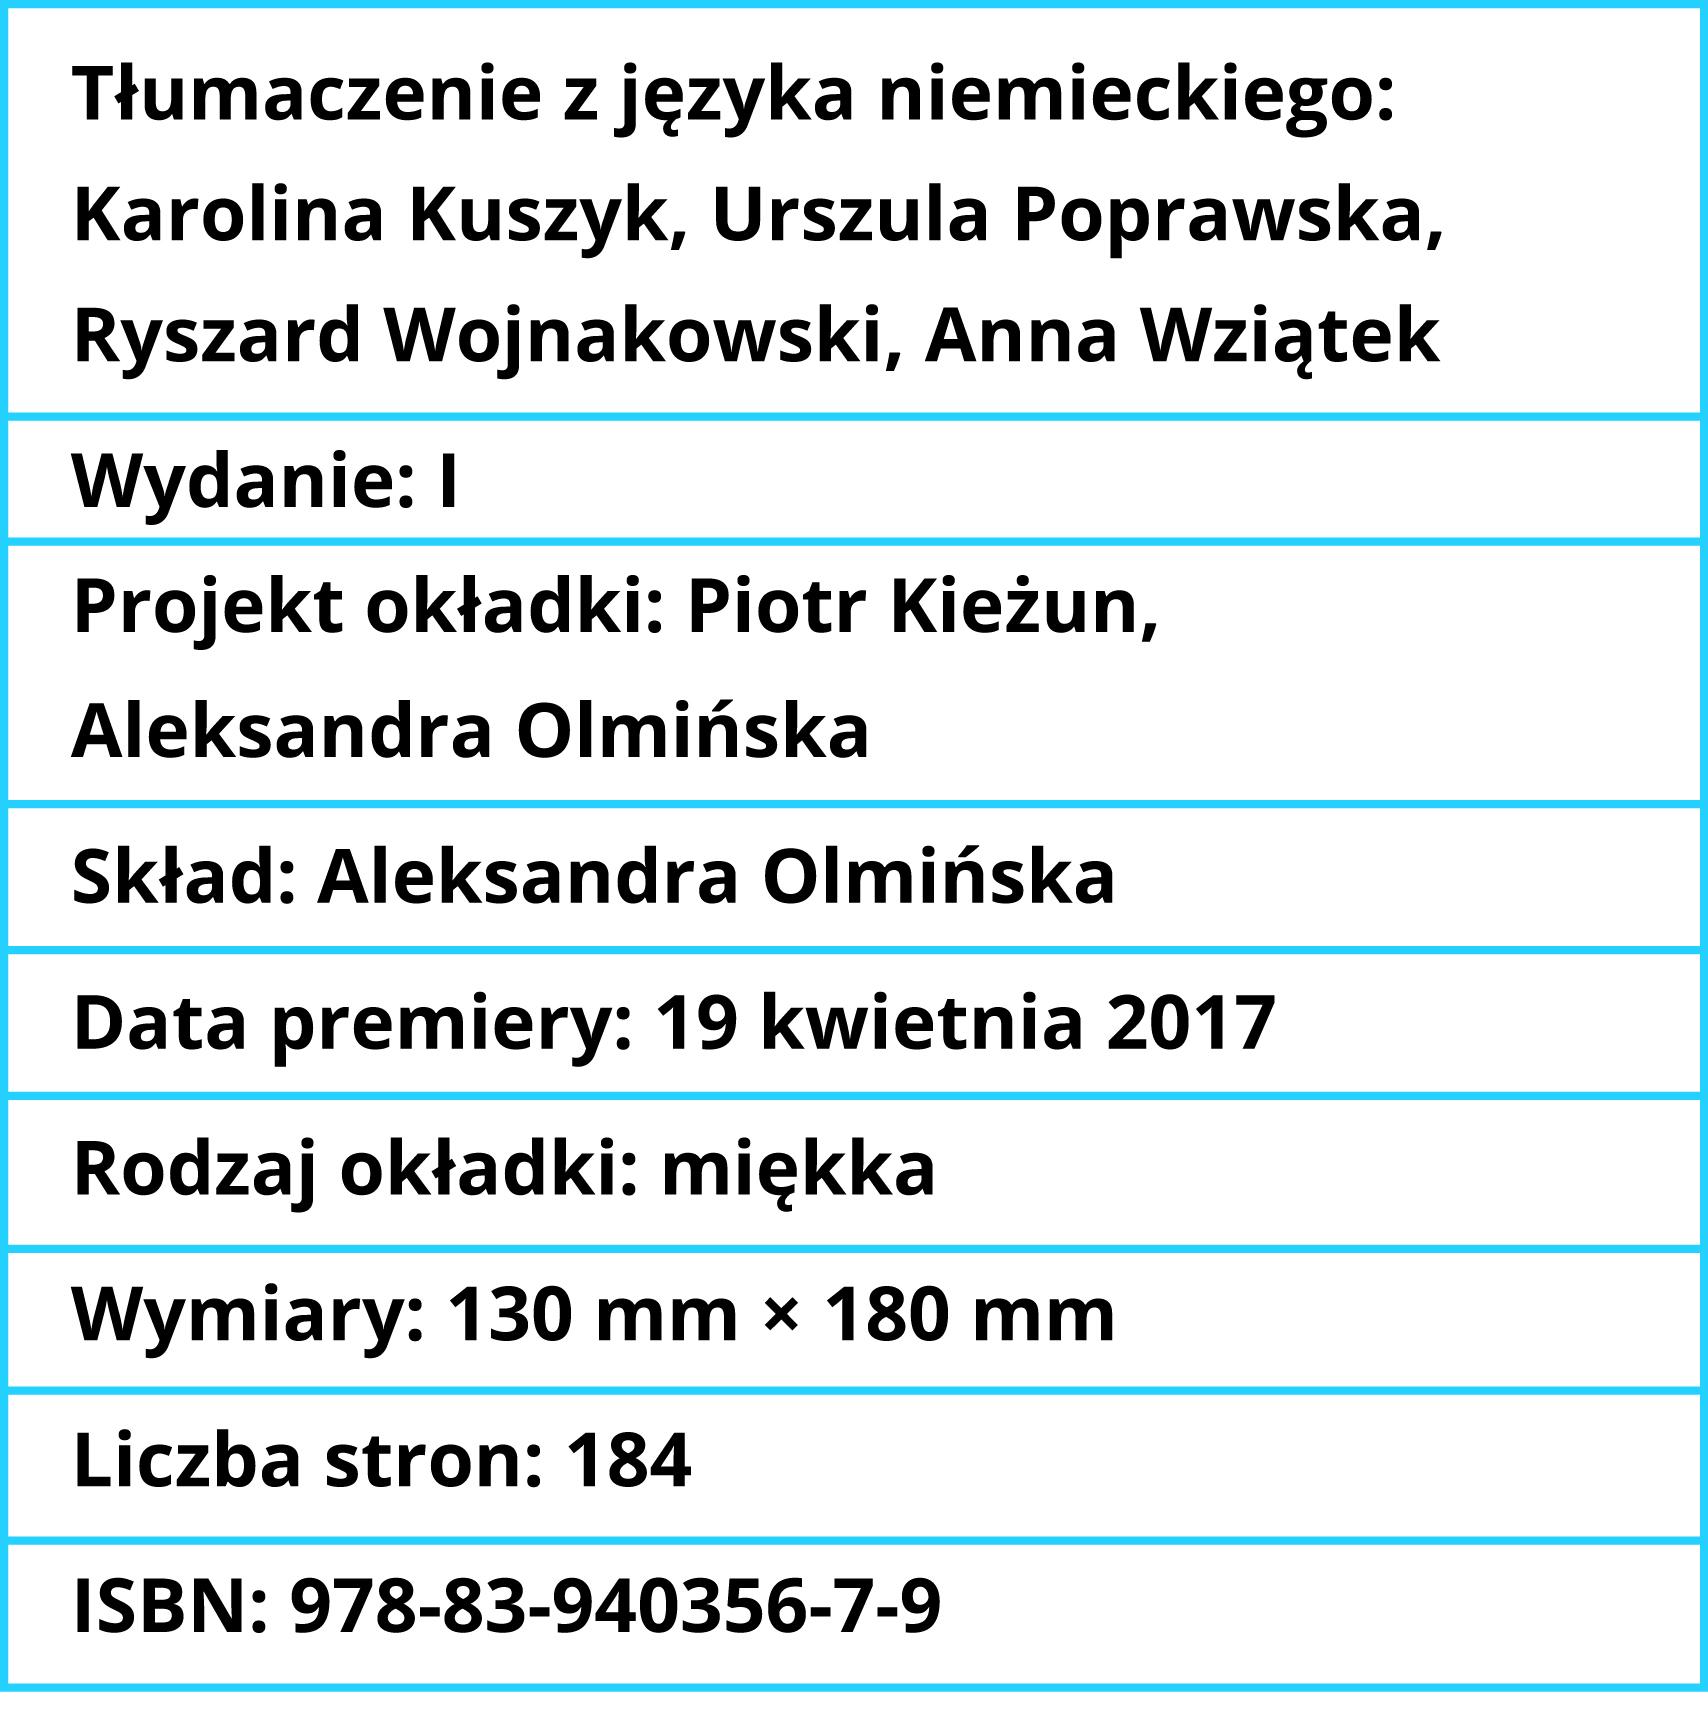 nota bibliograficzna_piata